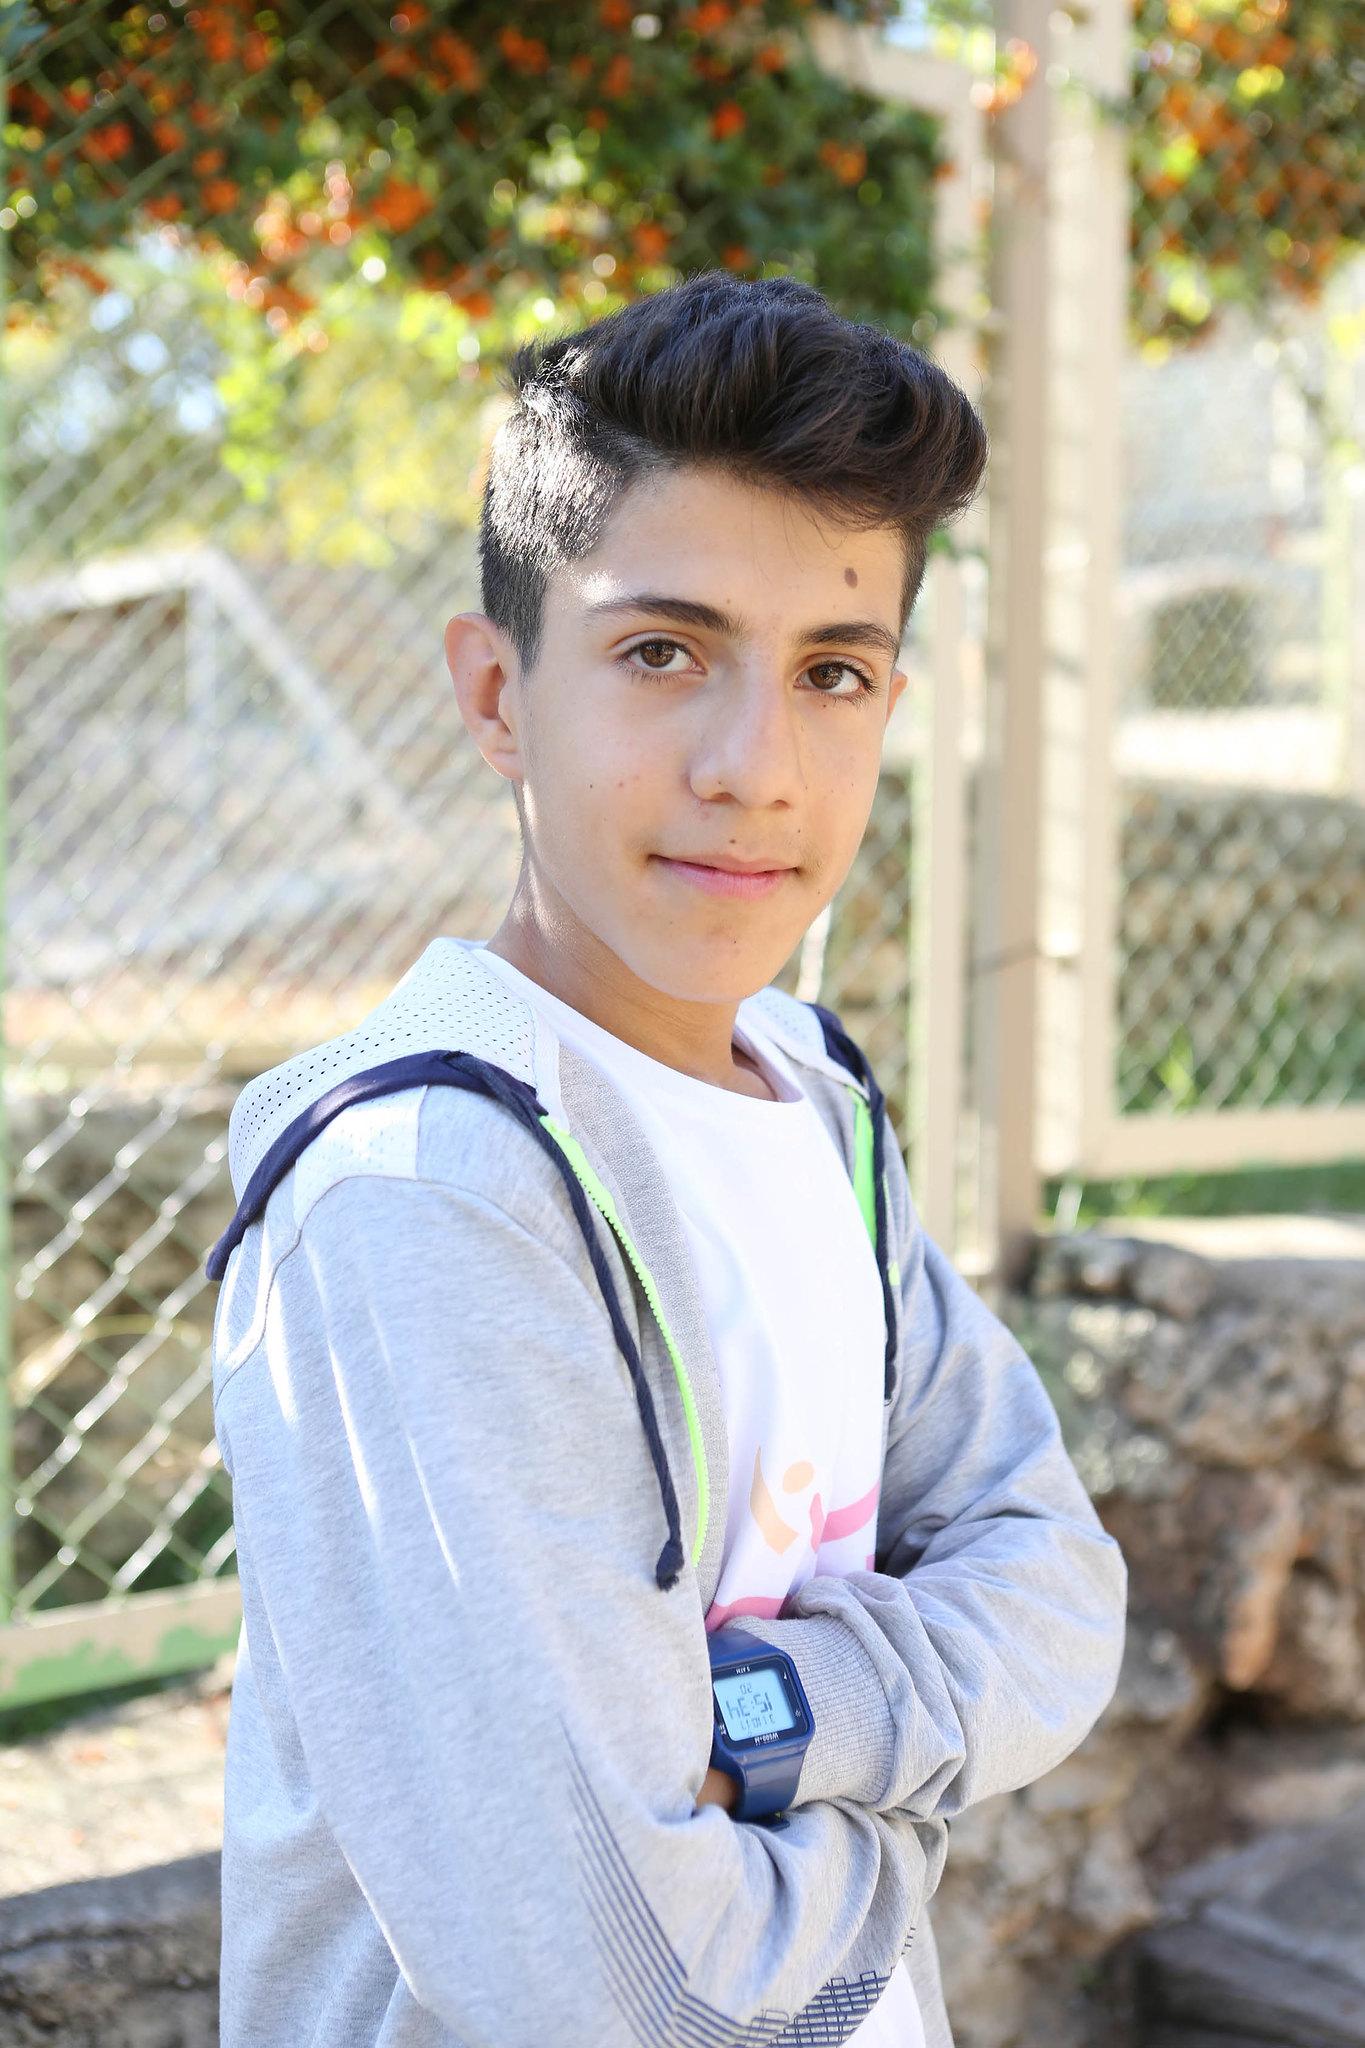 Sefa Orucan